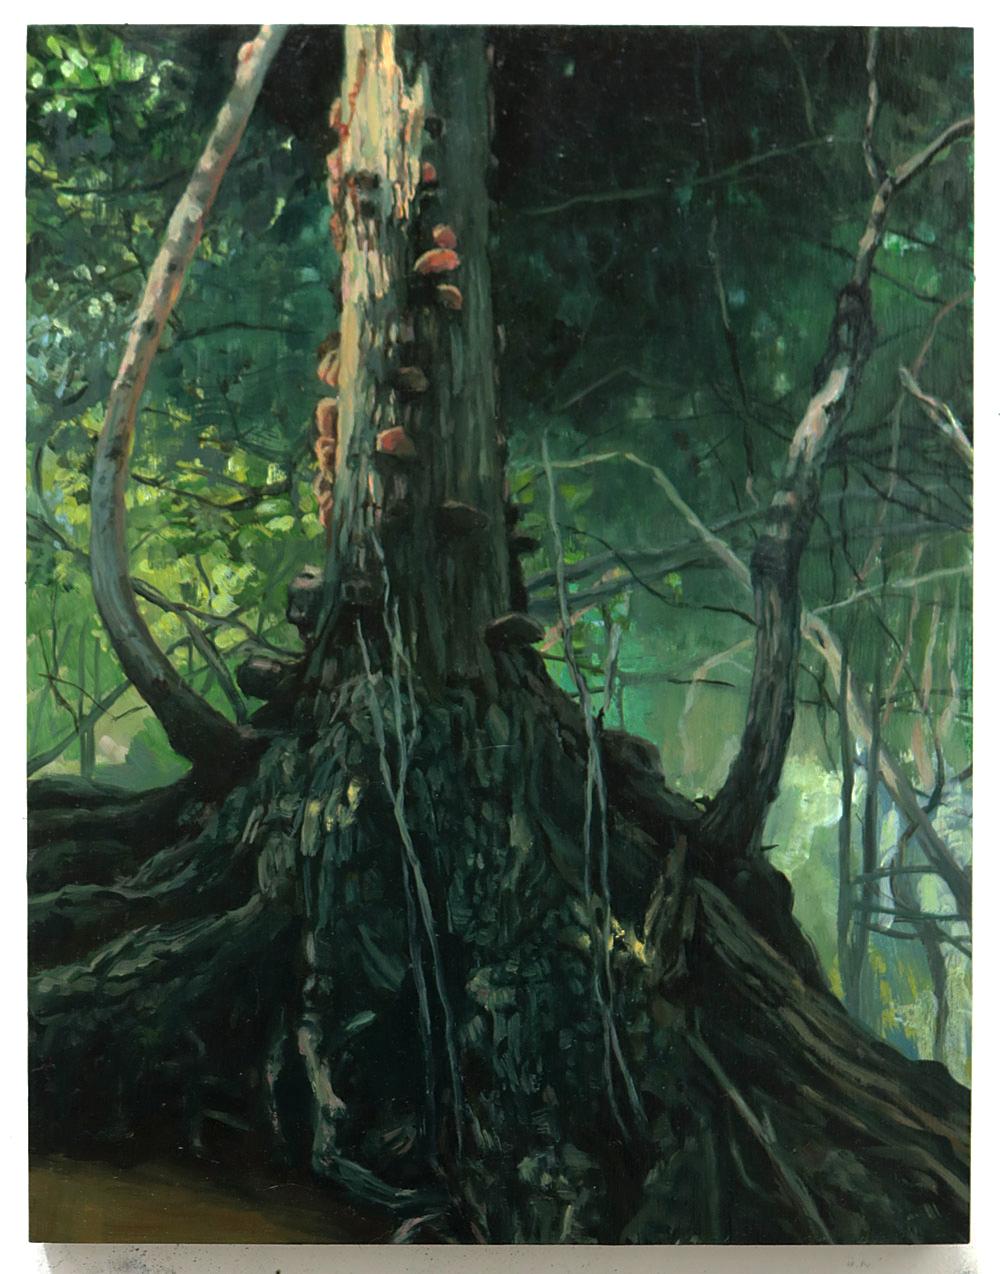 2_talluto_tree_with_fungus_18x14.jpg